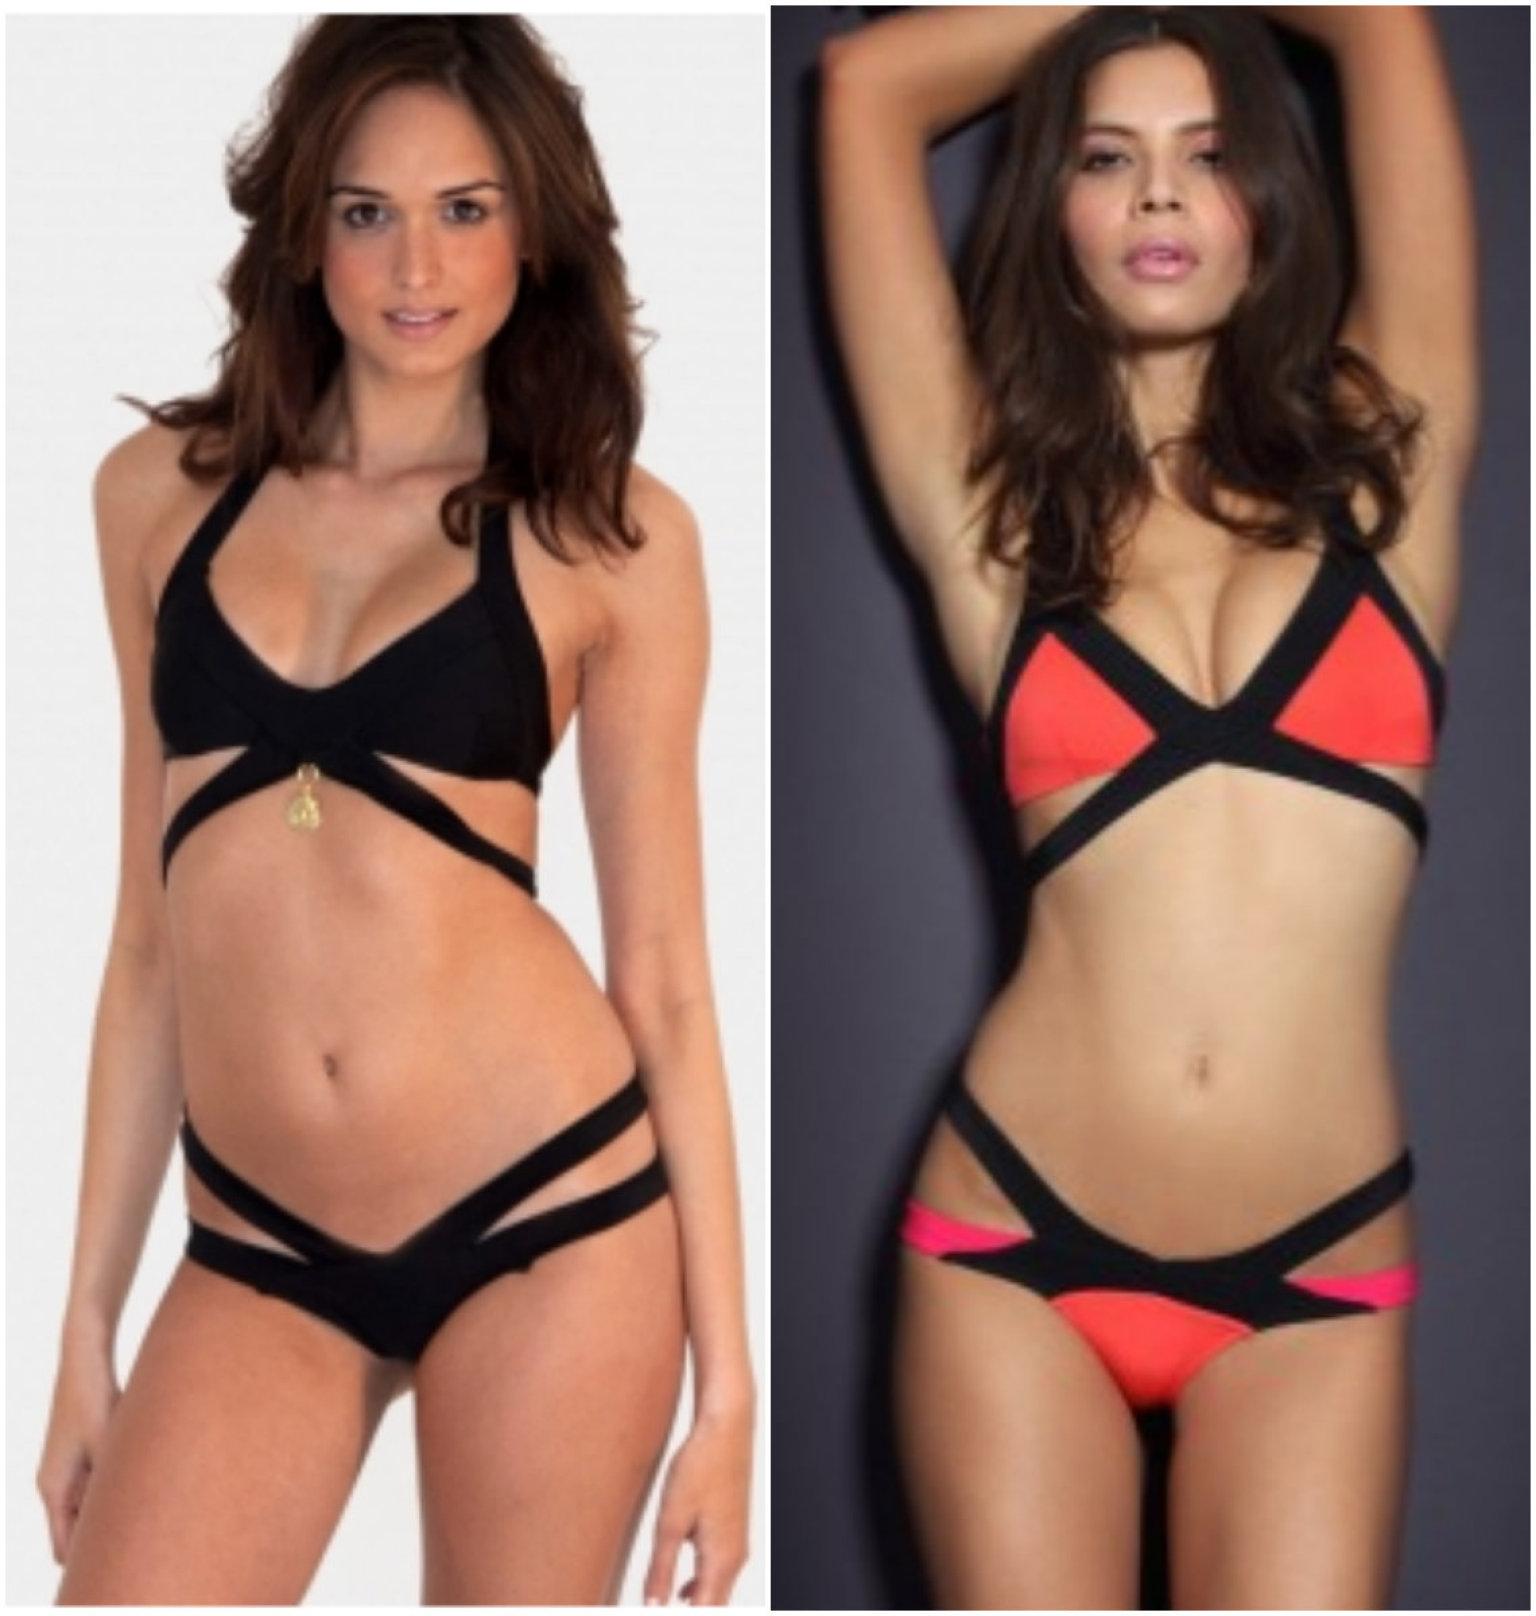 agent provocateur sues kimberley london for copycat bikini photos huffpost. Black Bedroom Furniture Sets. Home Design Ideas